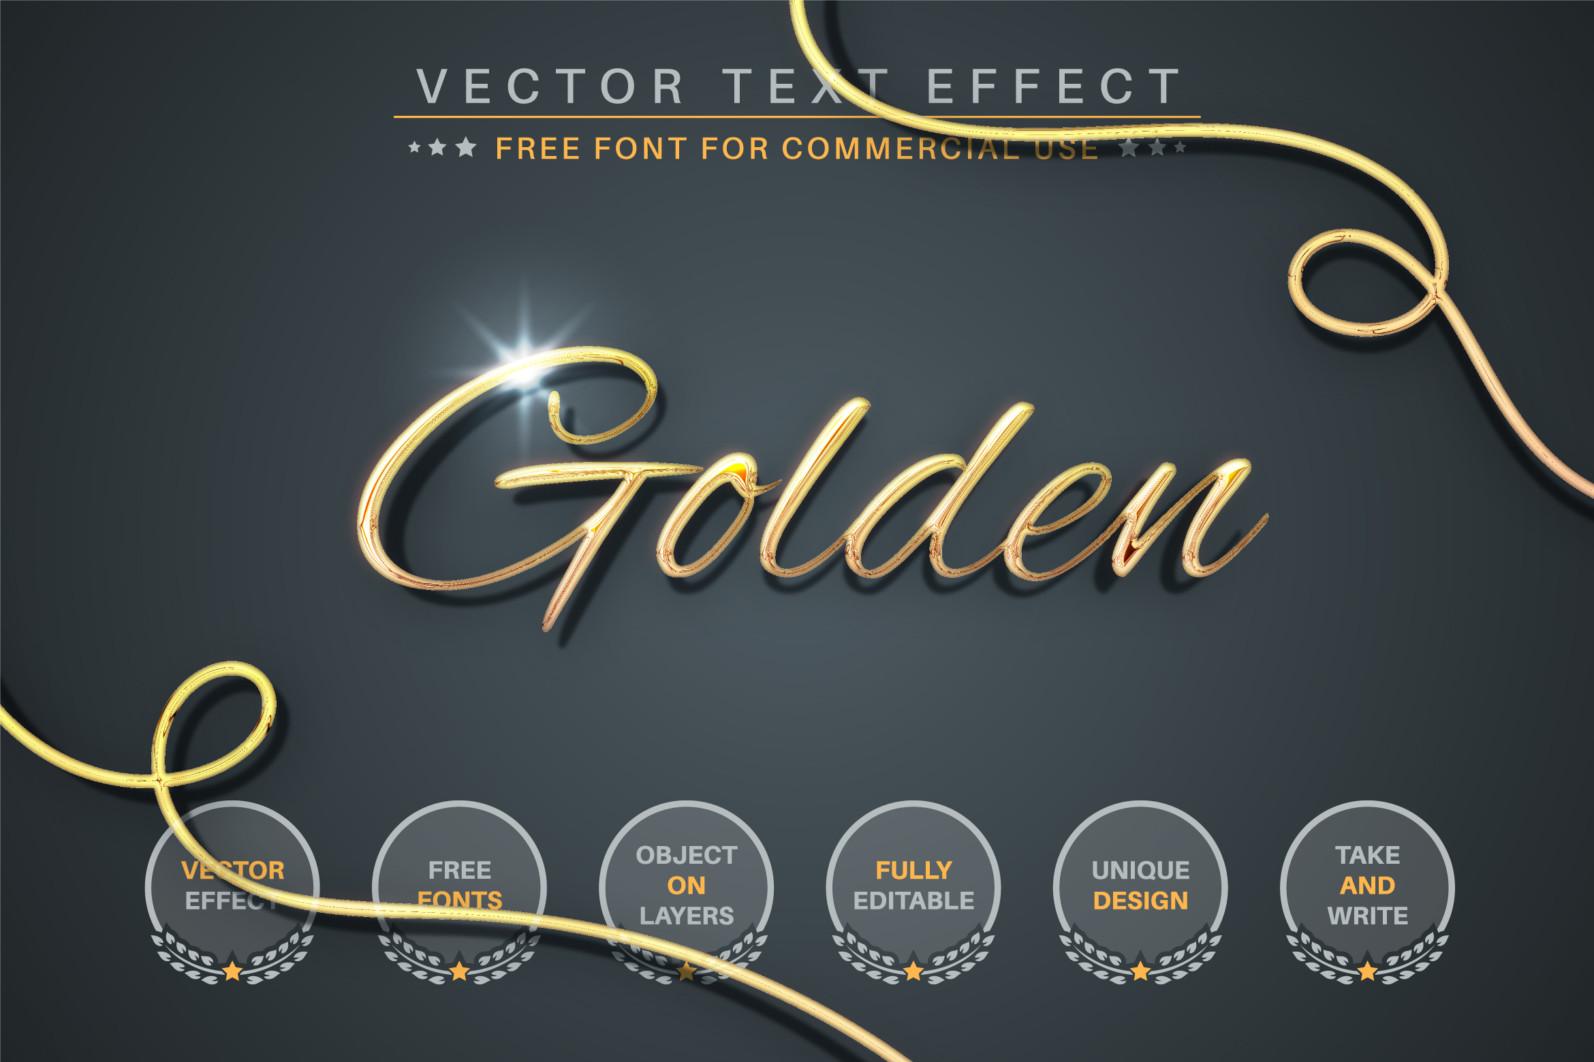 Golden Lettering Editable Text Effect, Font Style - 337 golden 2340X1560 -